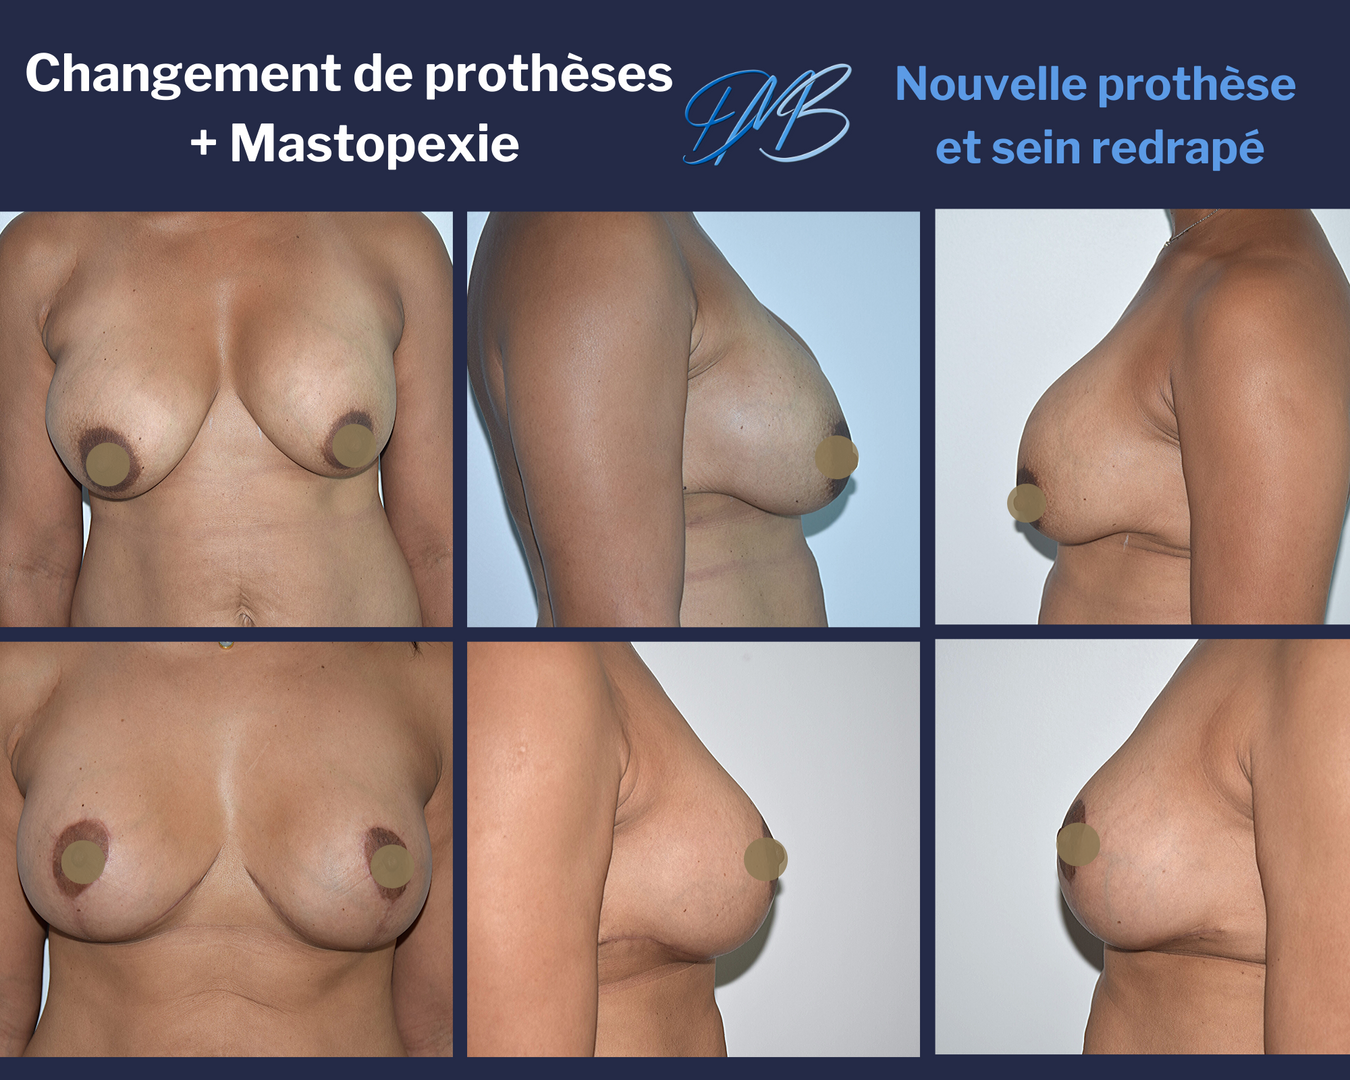 Changement de prothèses mammaires + mastopexie